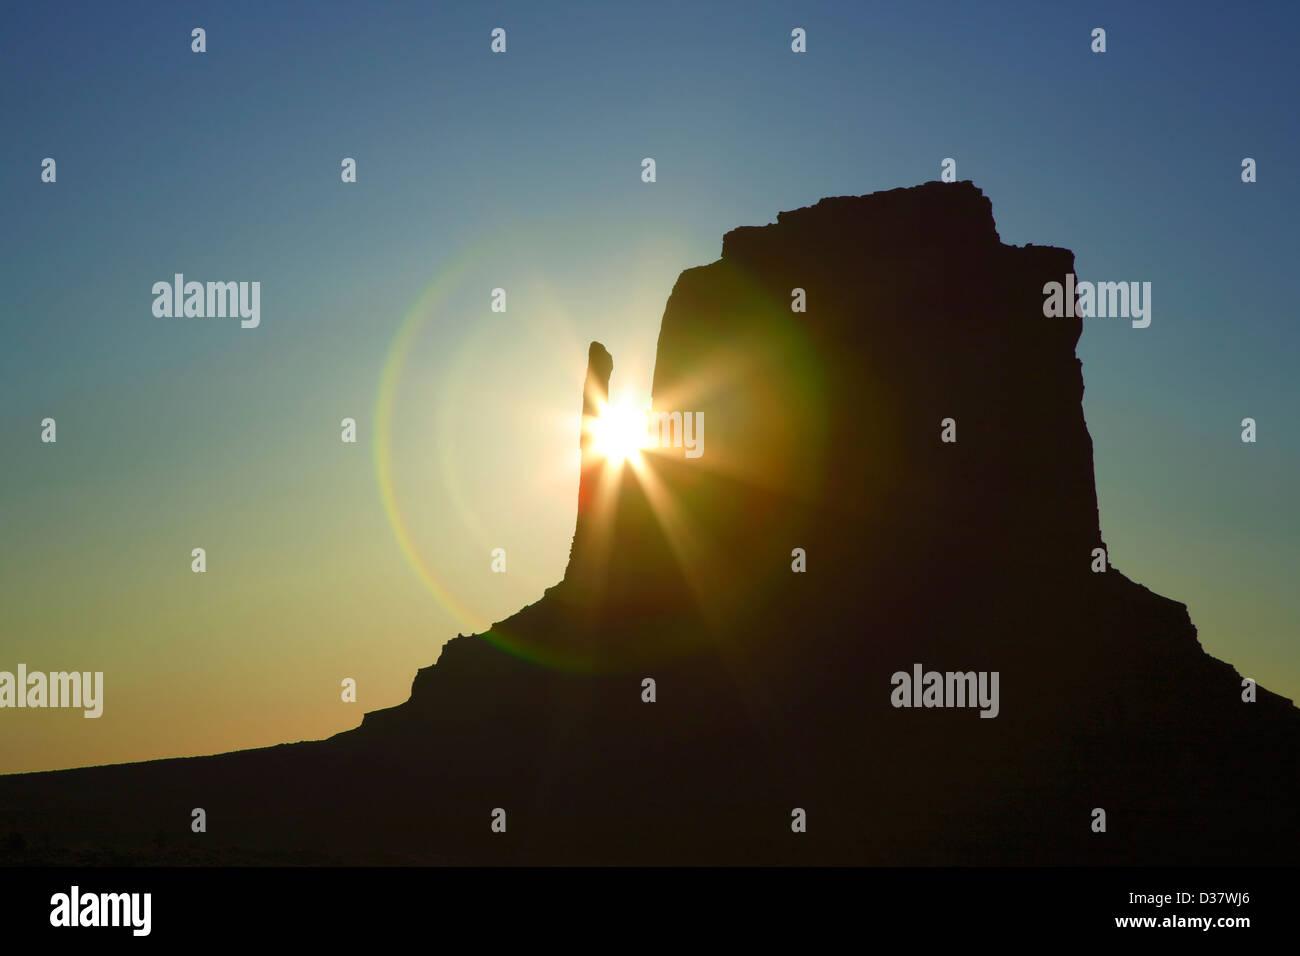 East Mitten and sunburst, Monument Valley, Arizona Utah border USA - Stock Image